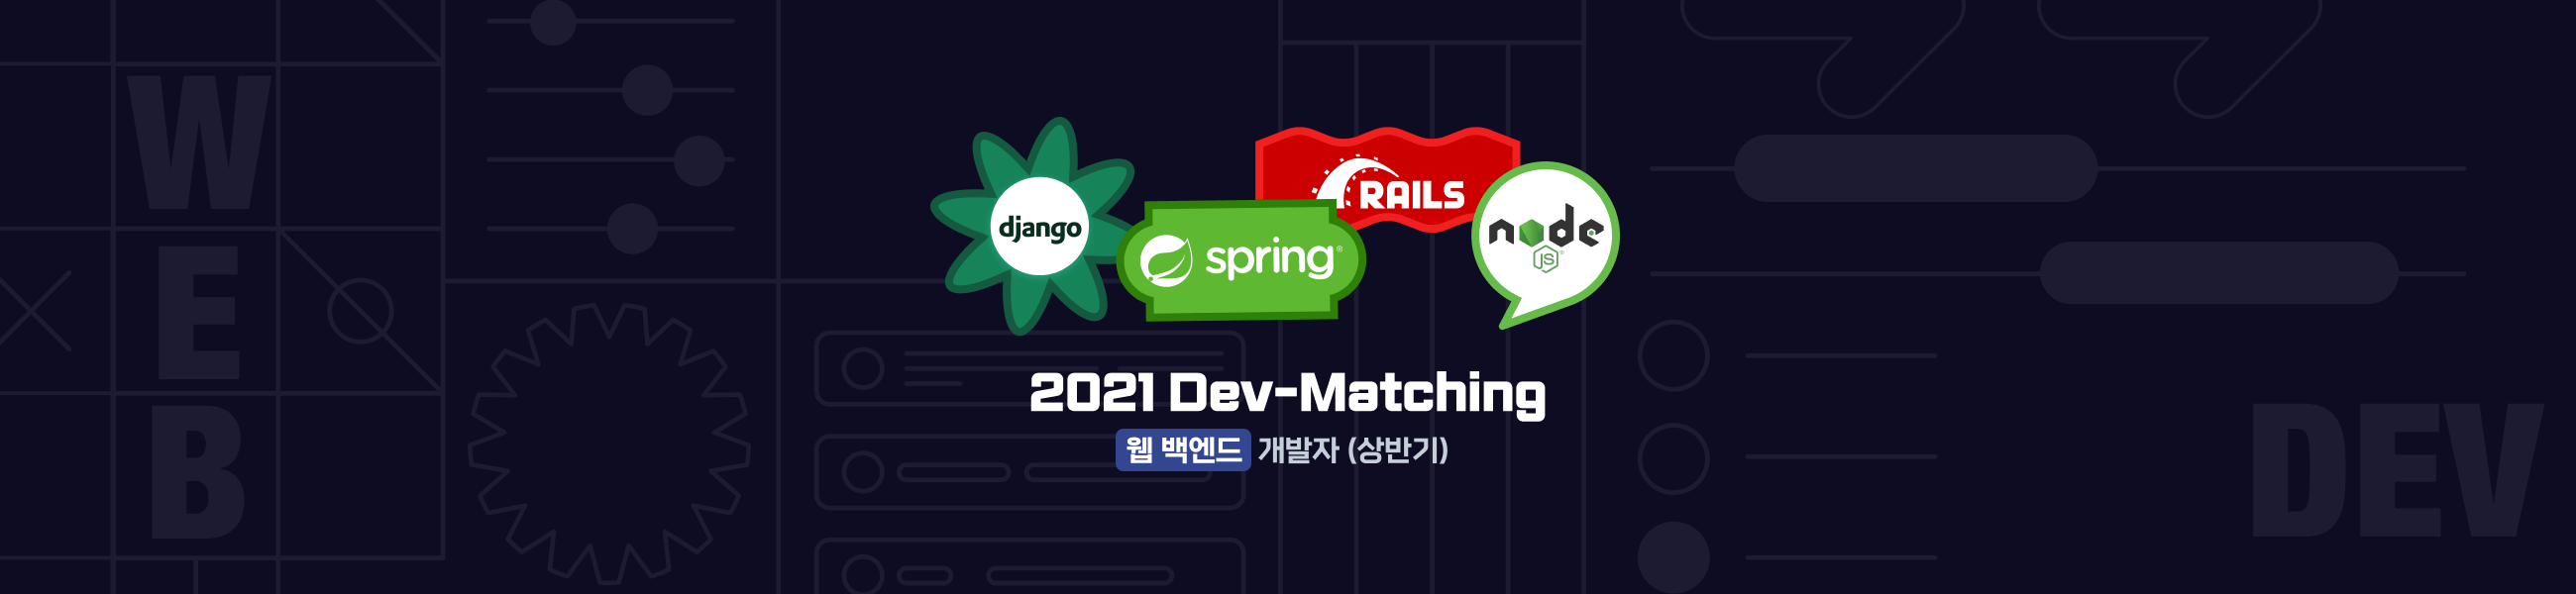 2021 Dev-Matching: 웹 백엔드 개발자(상반기)의 이미지